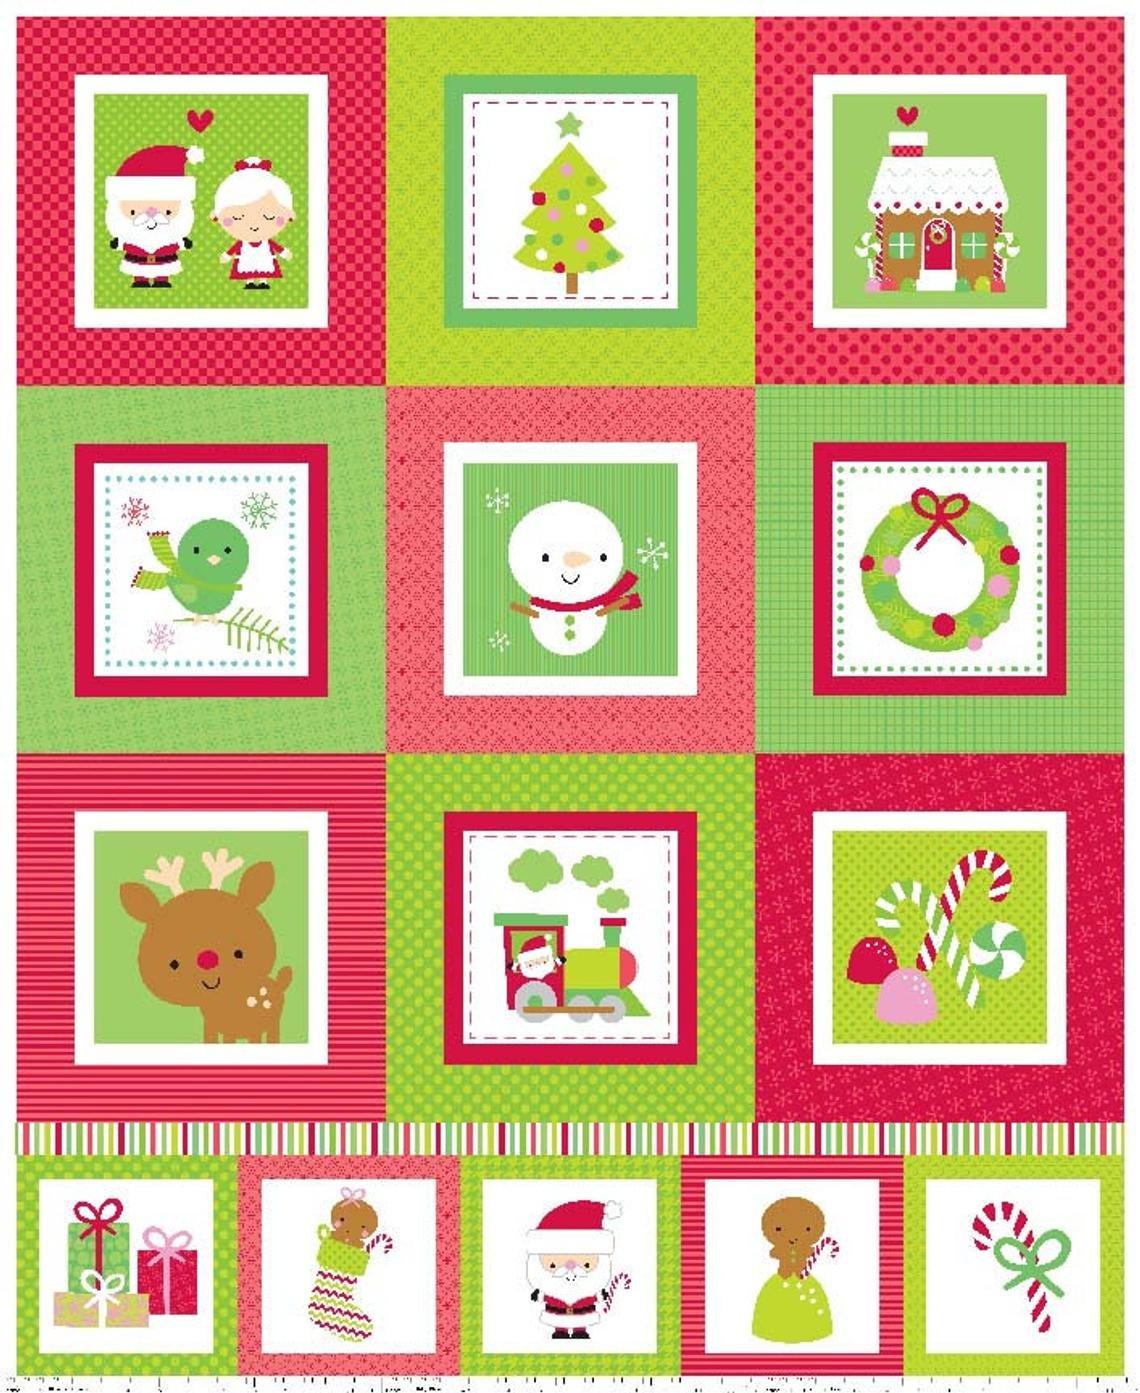 Santa Express Quilt Panel in Blocks by Riley Blake